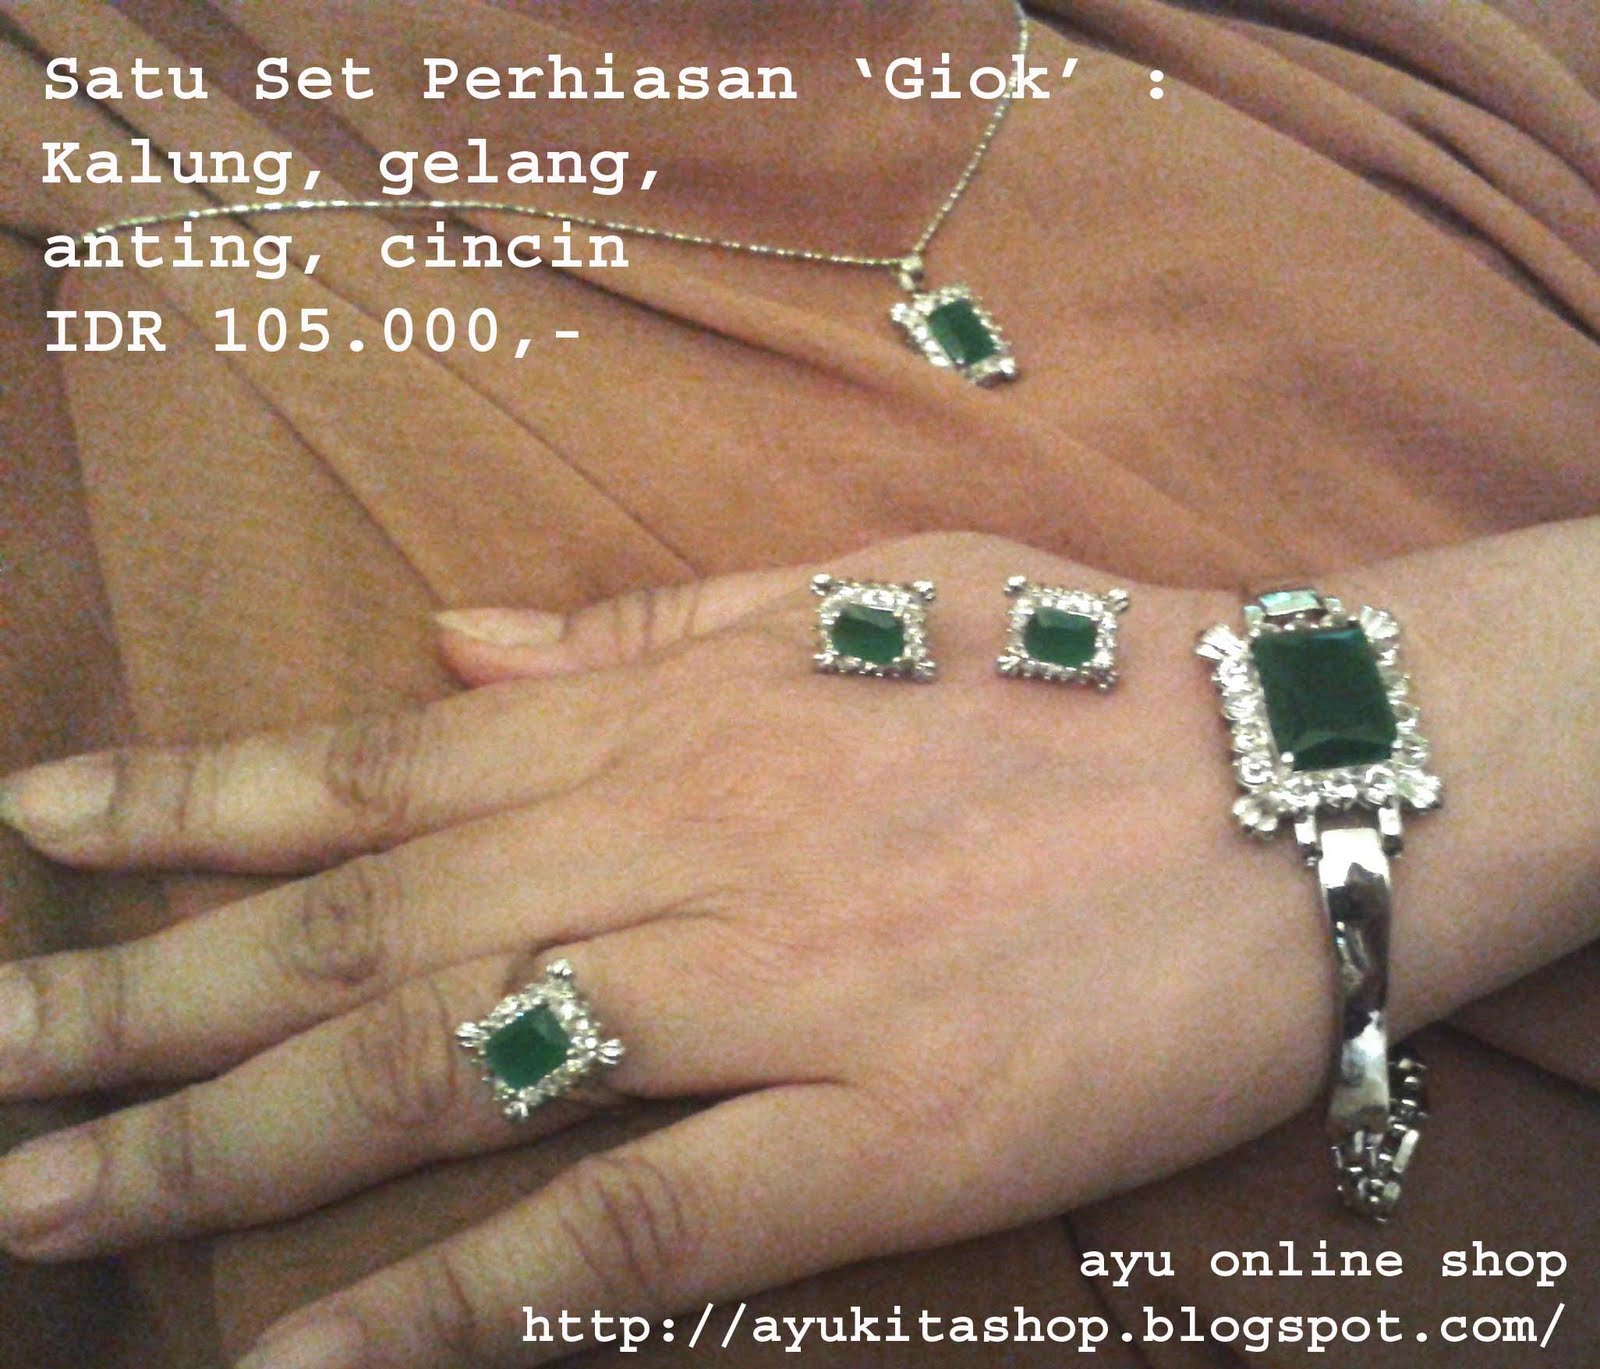 Harga Dan Spesifikasi Perhiasan 1 Set Termurah 2018 Rhodium Ayukitashop Fashion Jewerly Po Satu Bagus Murah Giok Batu Hijau Berkualitas Rantai Stainles